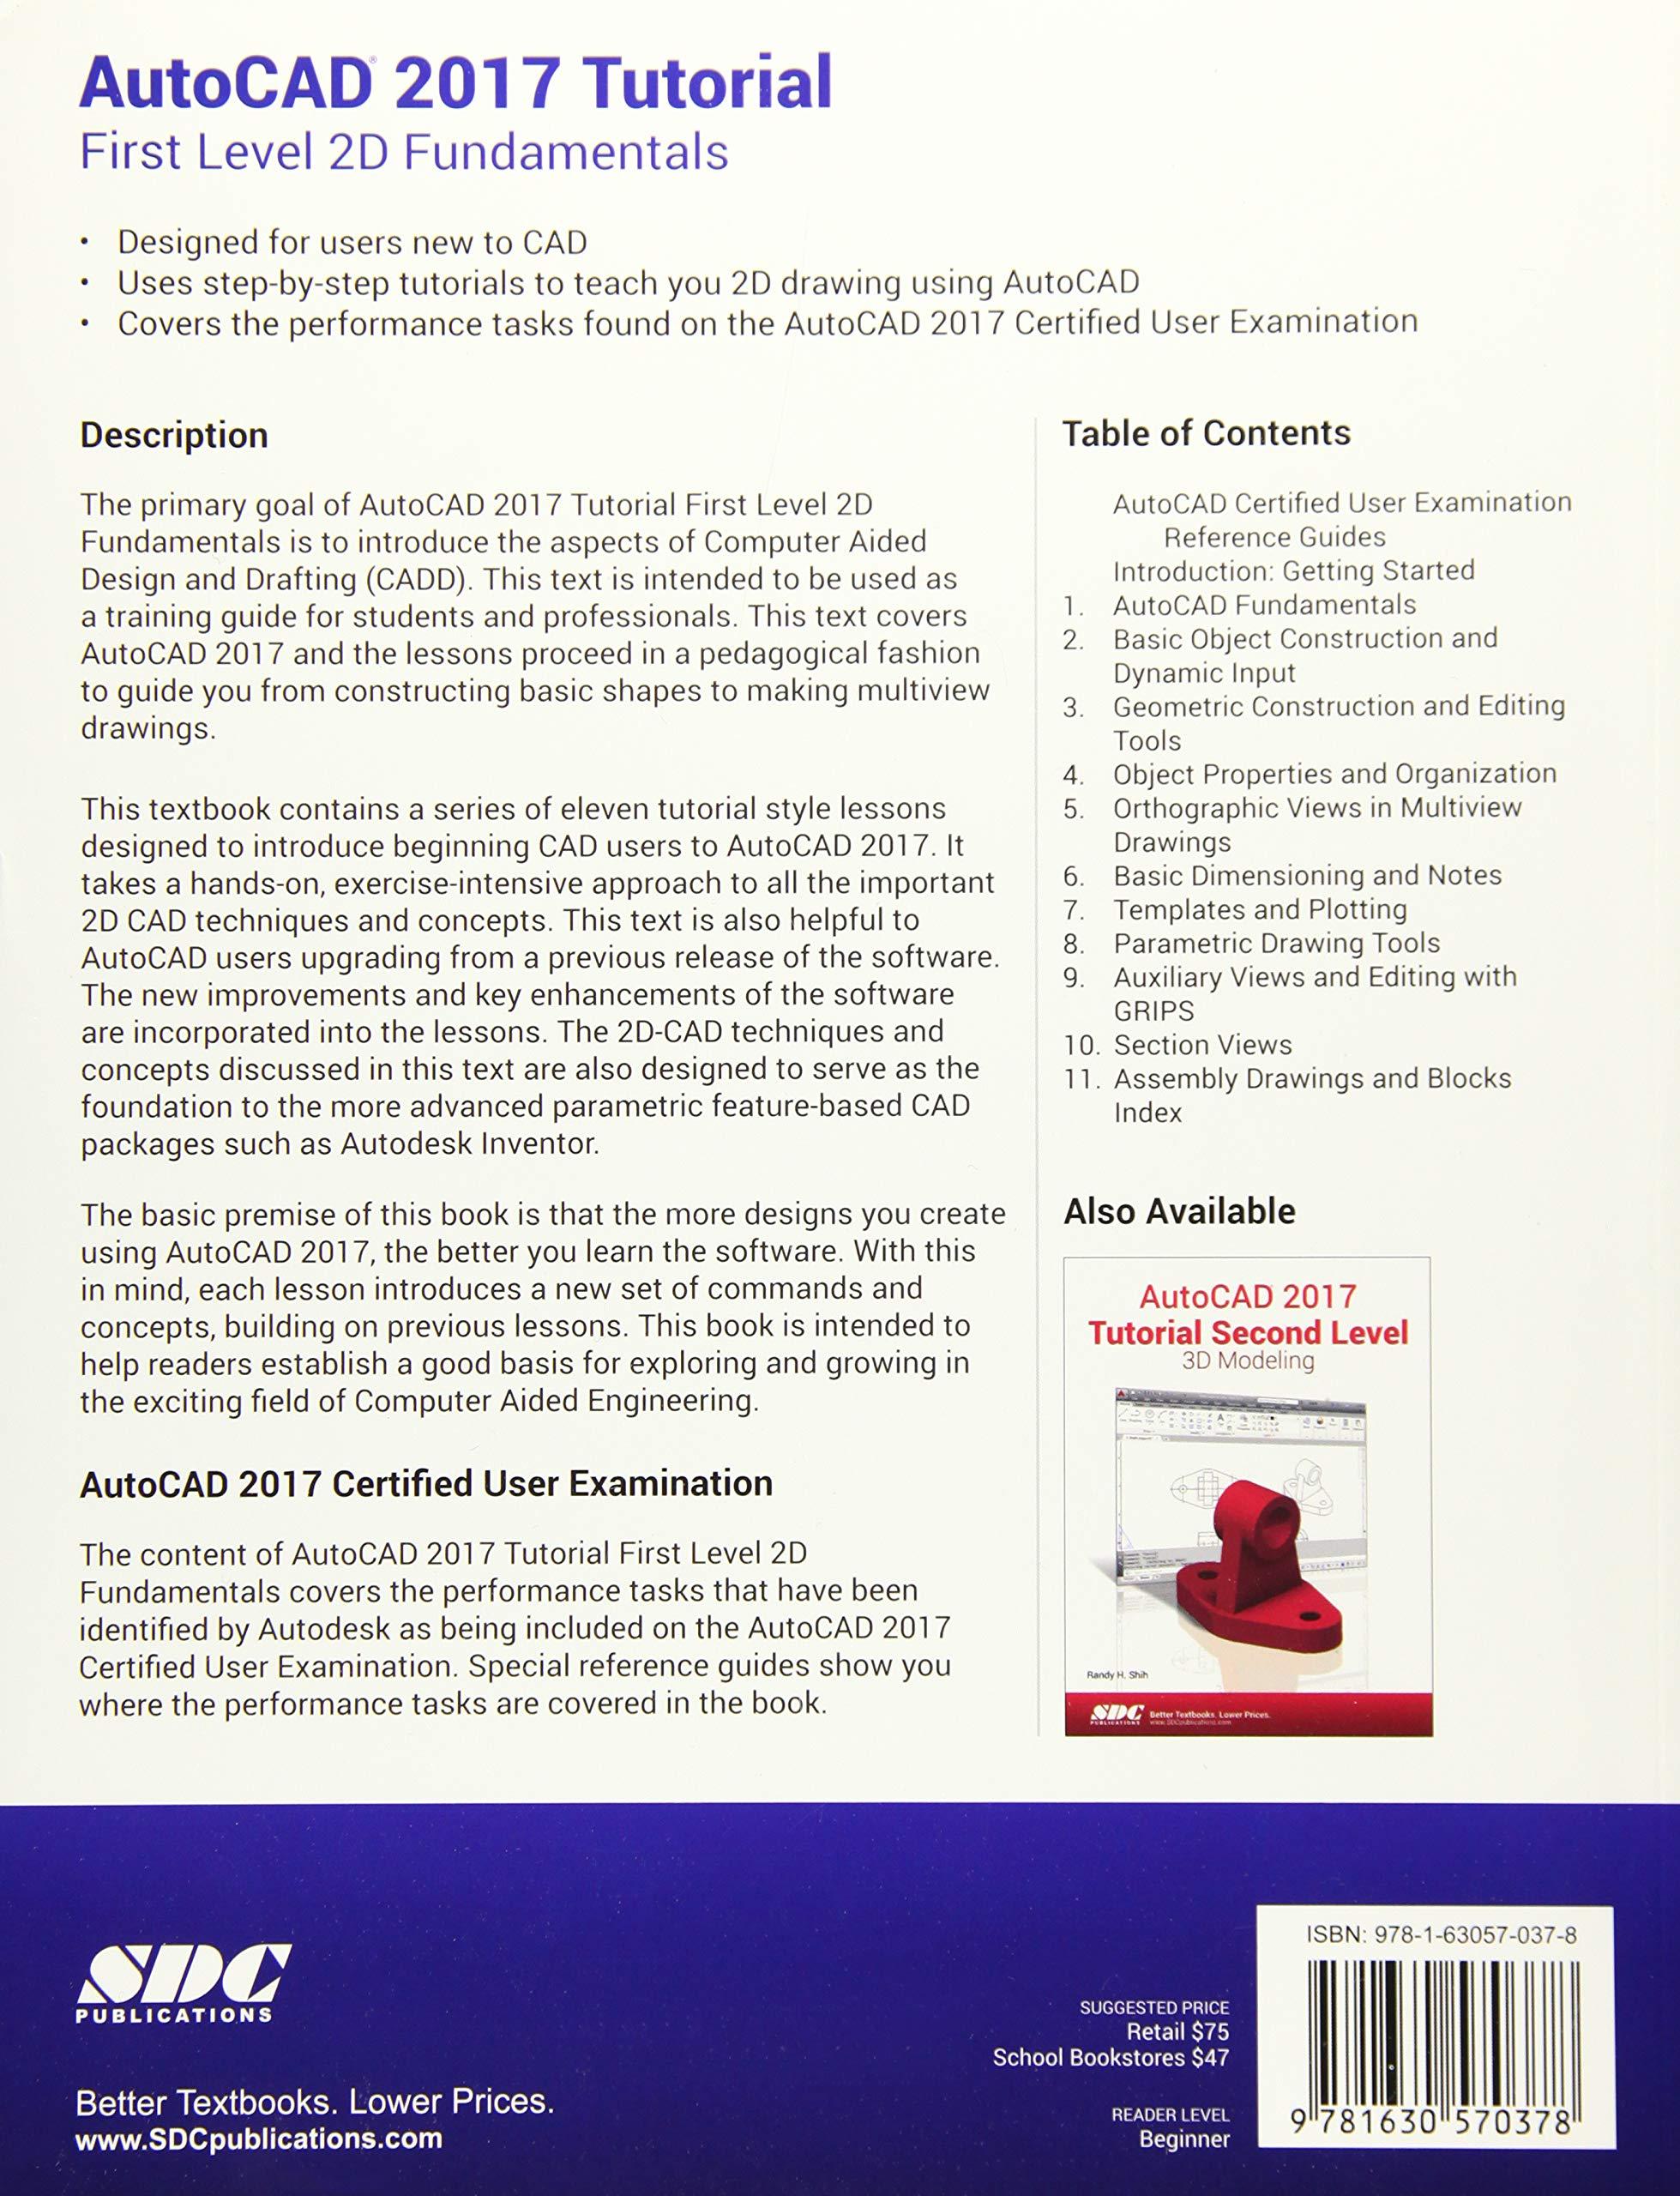 AutoCAD 2017 Tutorial First Level 2D Fundamentals: Randy H